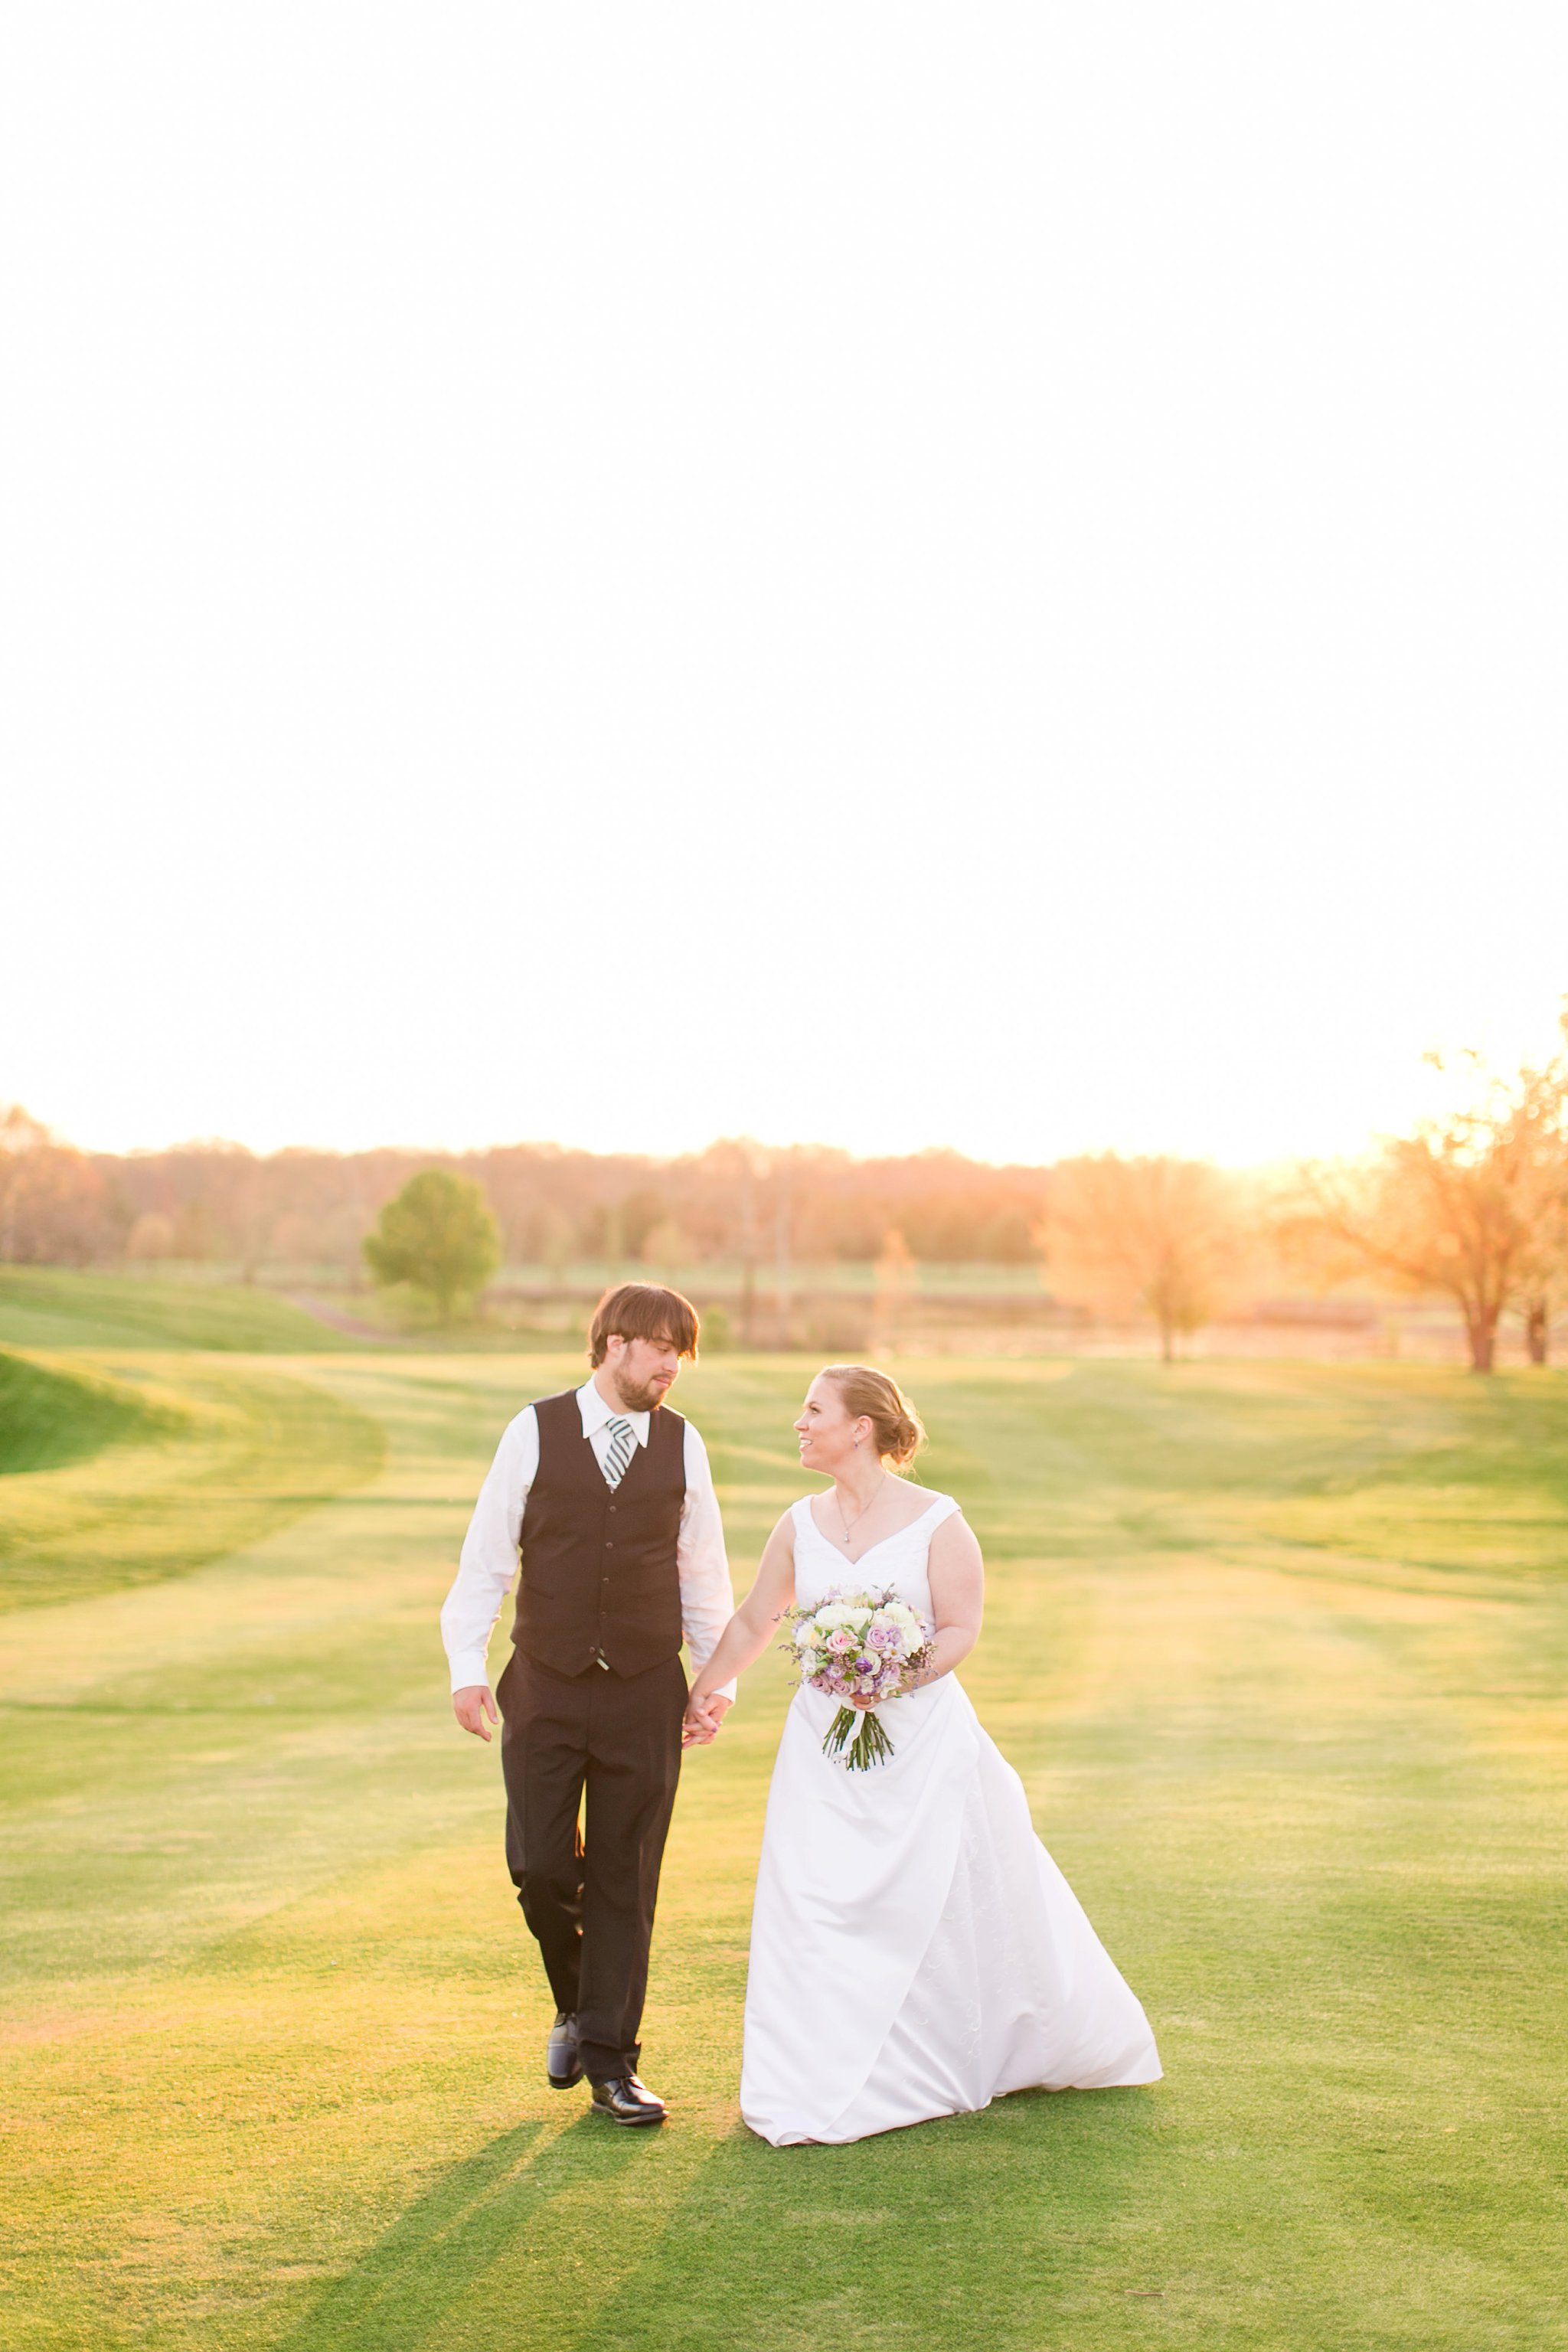 Chantilly National Golf Club Wedding Photos Virginia Wedding Photographer Megan Kelsey Photography Mary Beth and Nathan-119.jpg